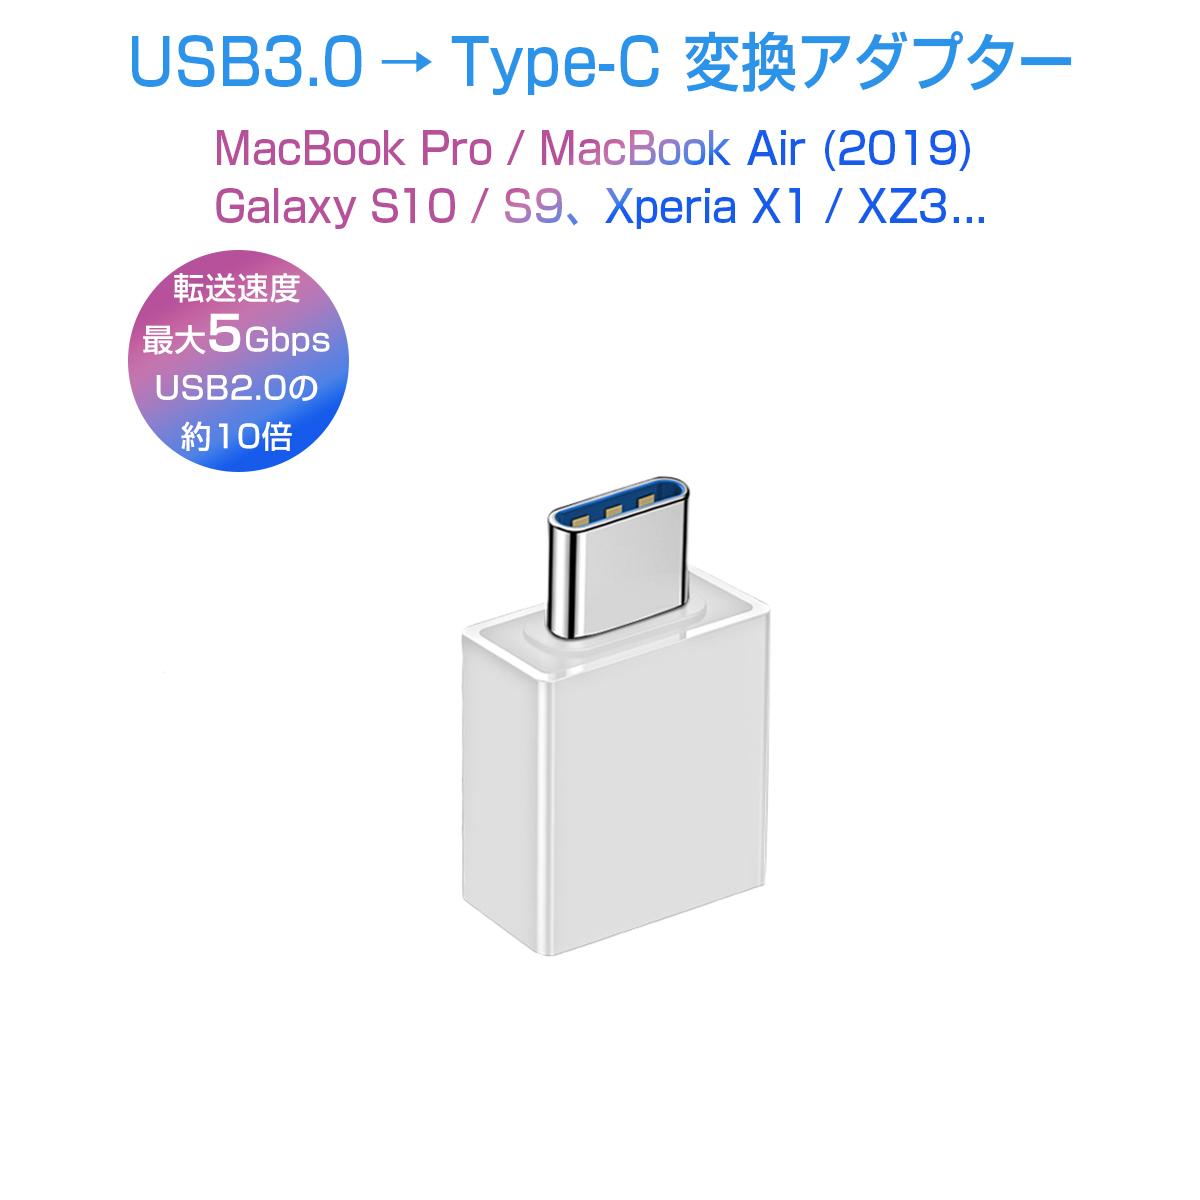 USB Type C USB 3.0 変換アダプター 白 高速データ転送 5Gbps USB2.0の10倍の速度 MacBook Pro/Air 2019対応 iPad Xperia X1/XZ3 Galaxy S10/S9 他対応 変換コネクター SDM便送料無料 1ヶ月保証 K&M